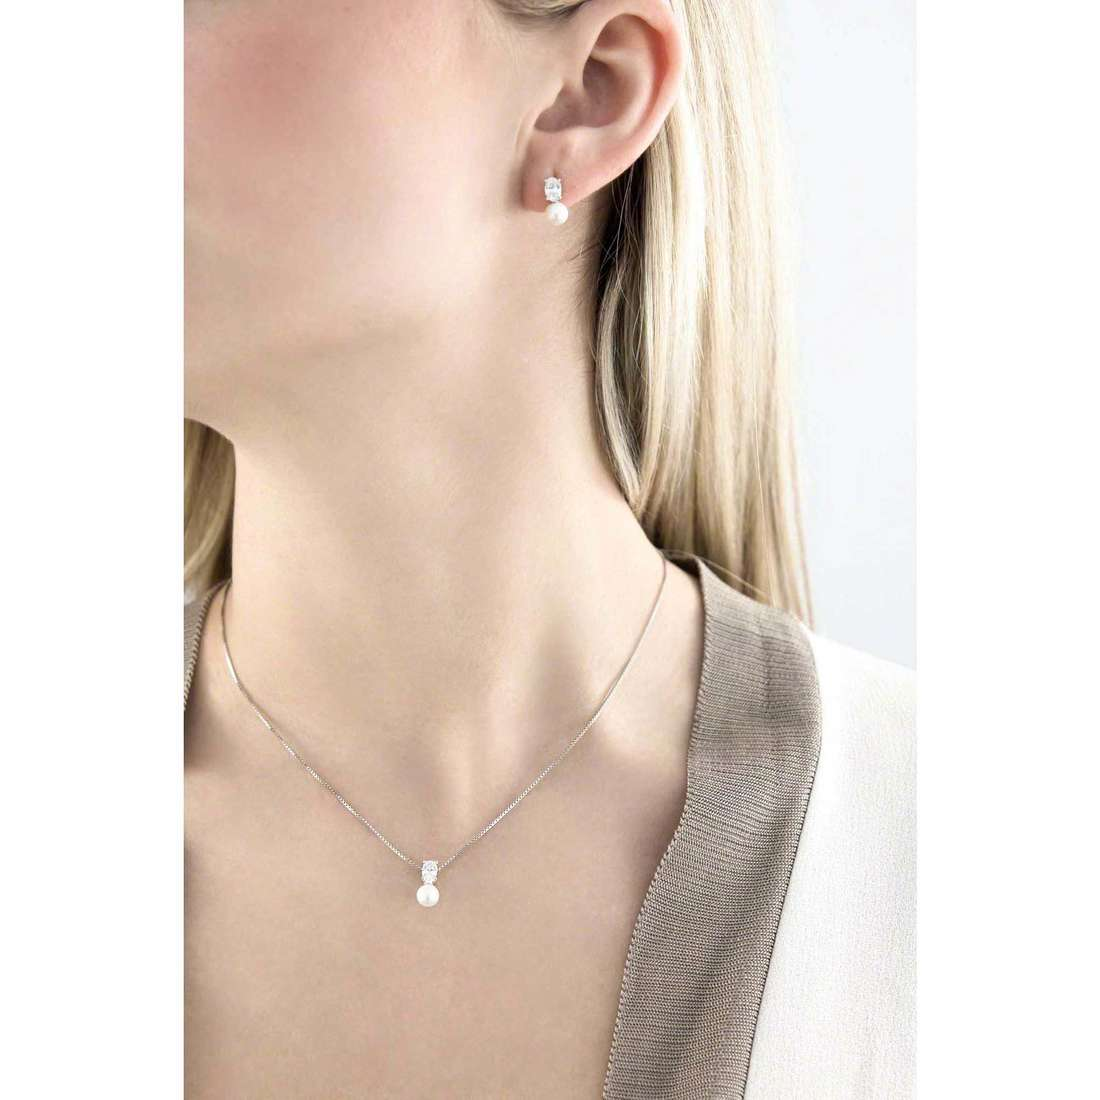 GioiaPura colliers femme 33856-01-00 indosso